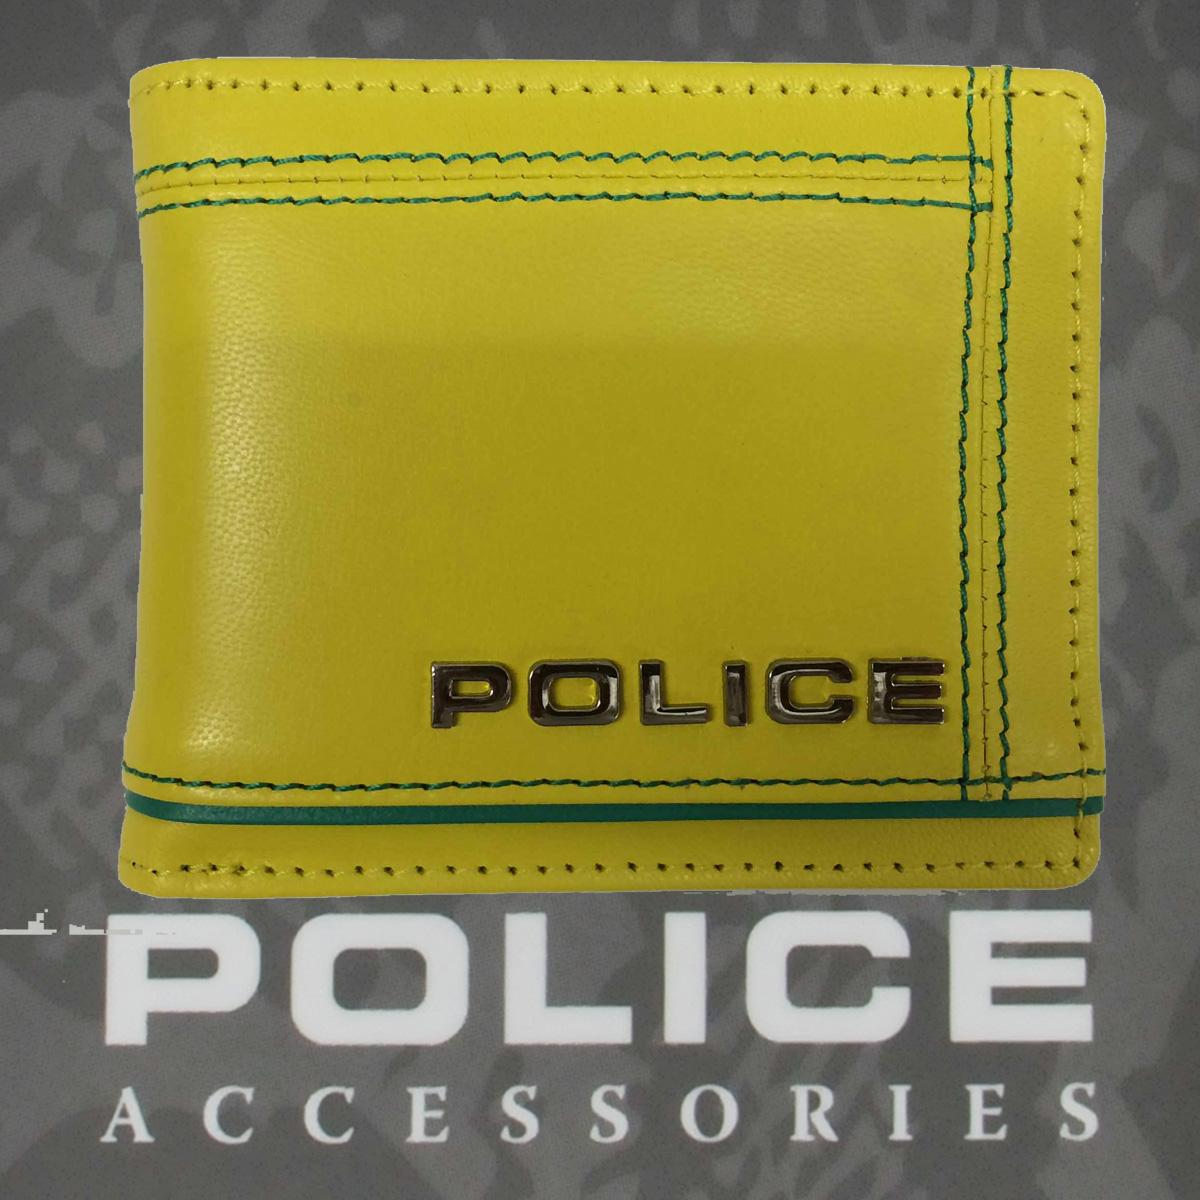 POLICE メンズ 二つ折り財布 COLORS  イエロー【PA-58400-80】